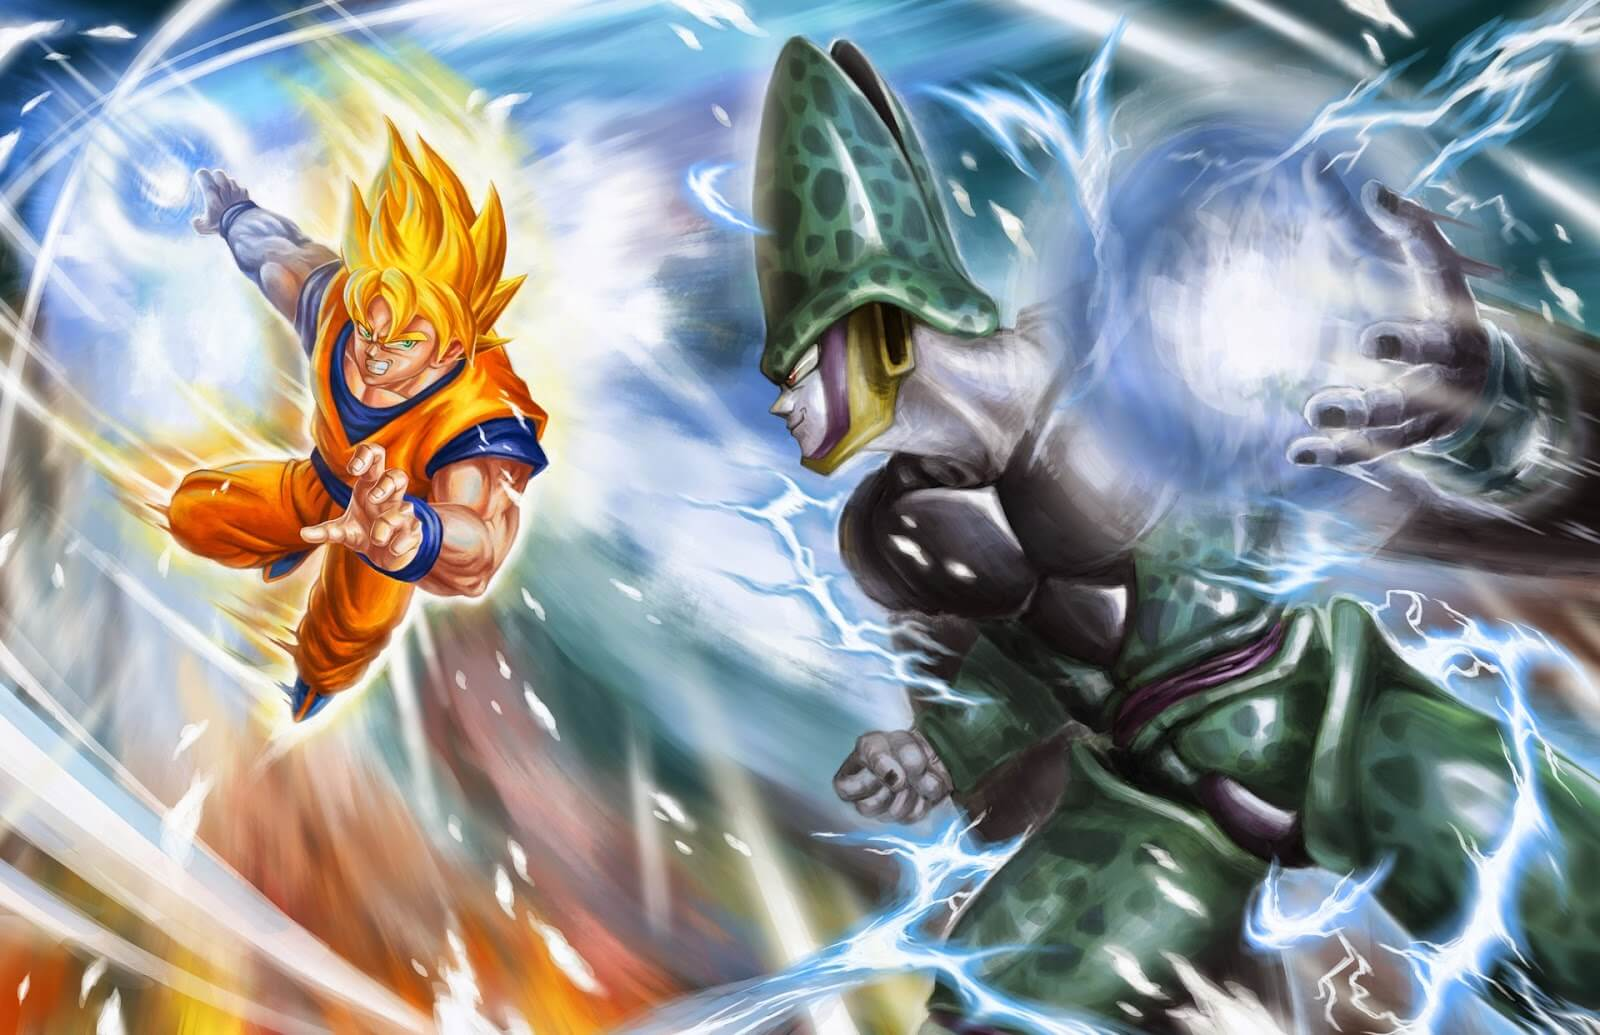 Wallpapers De Dragon Ball Z 4k Full Hd Dragon Ball Super 125459 Hd Wallpaper Backgrounds Download